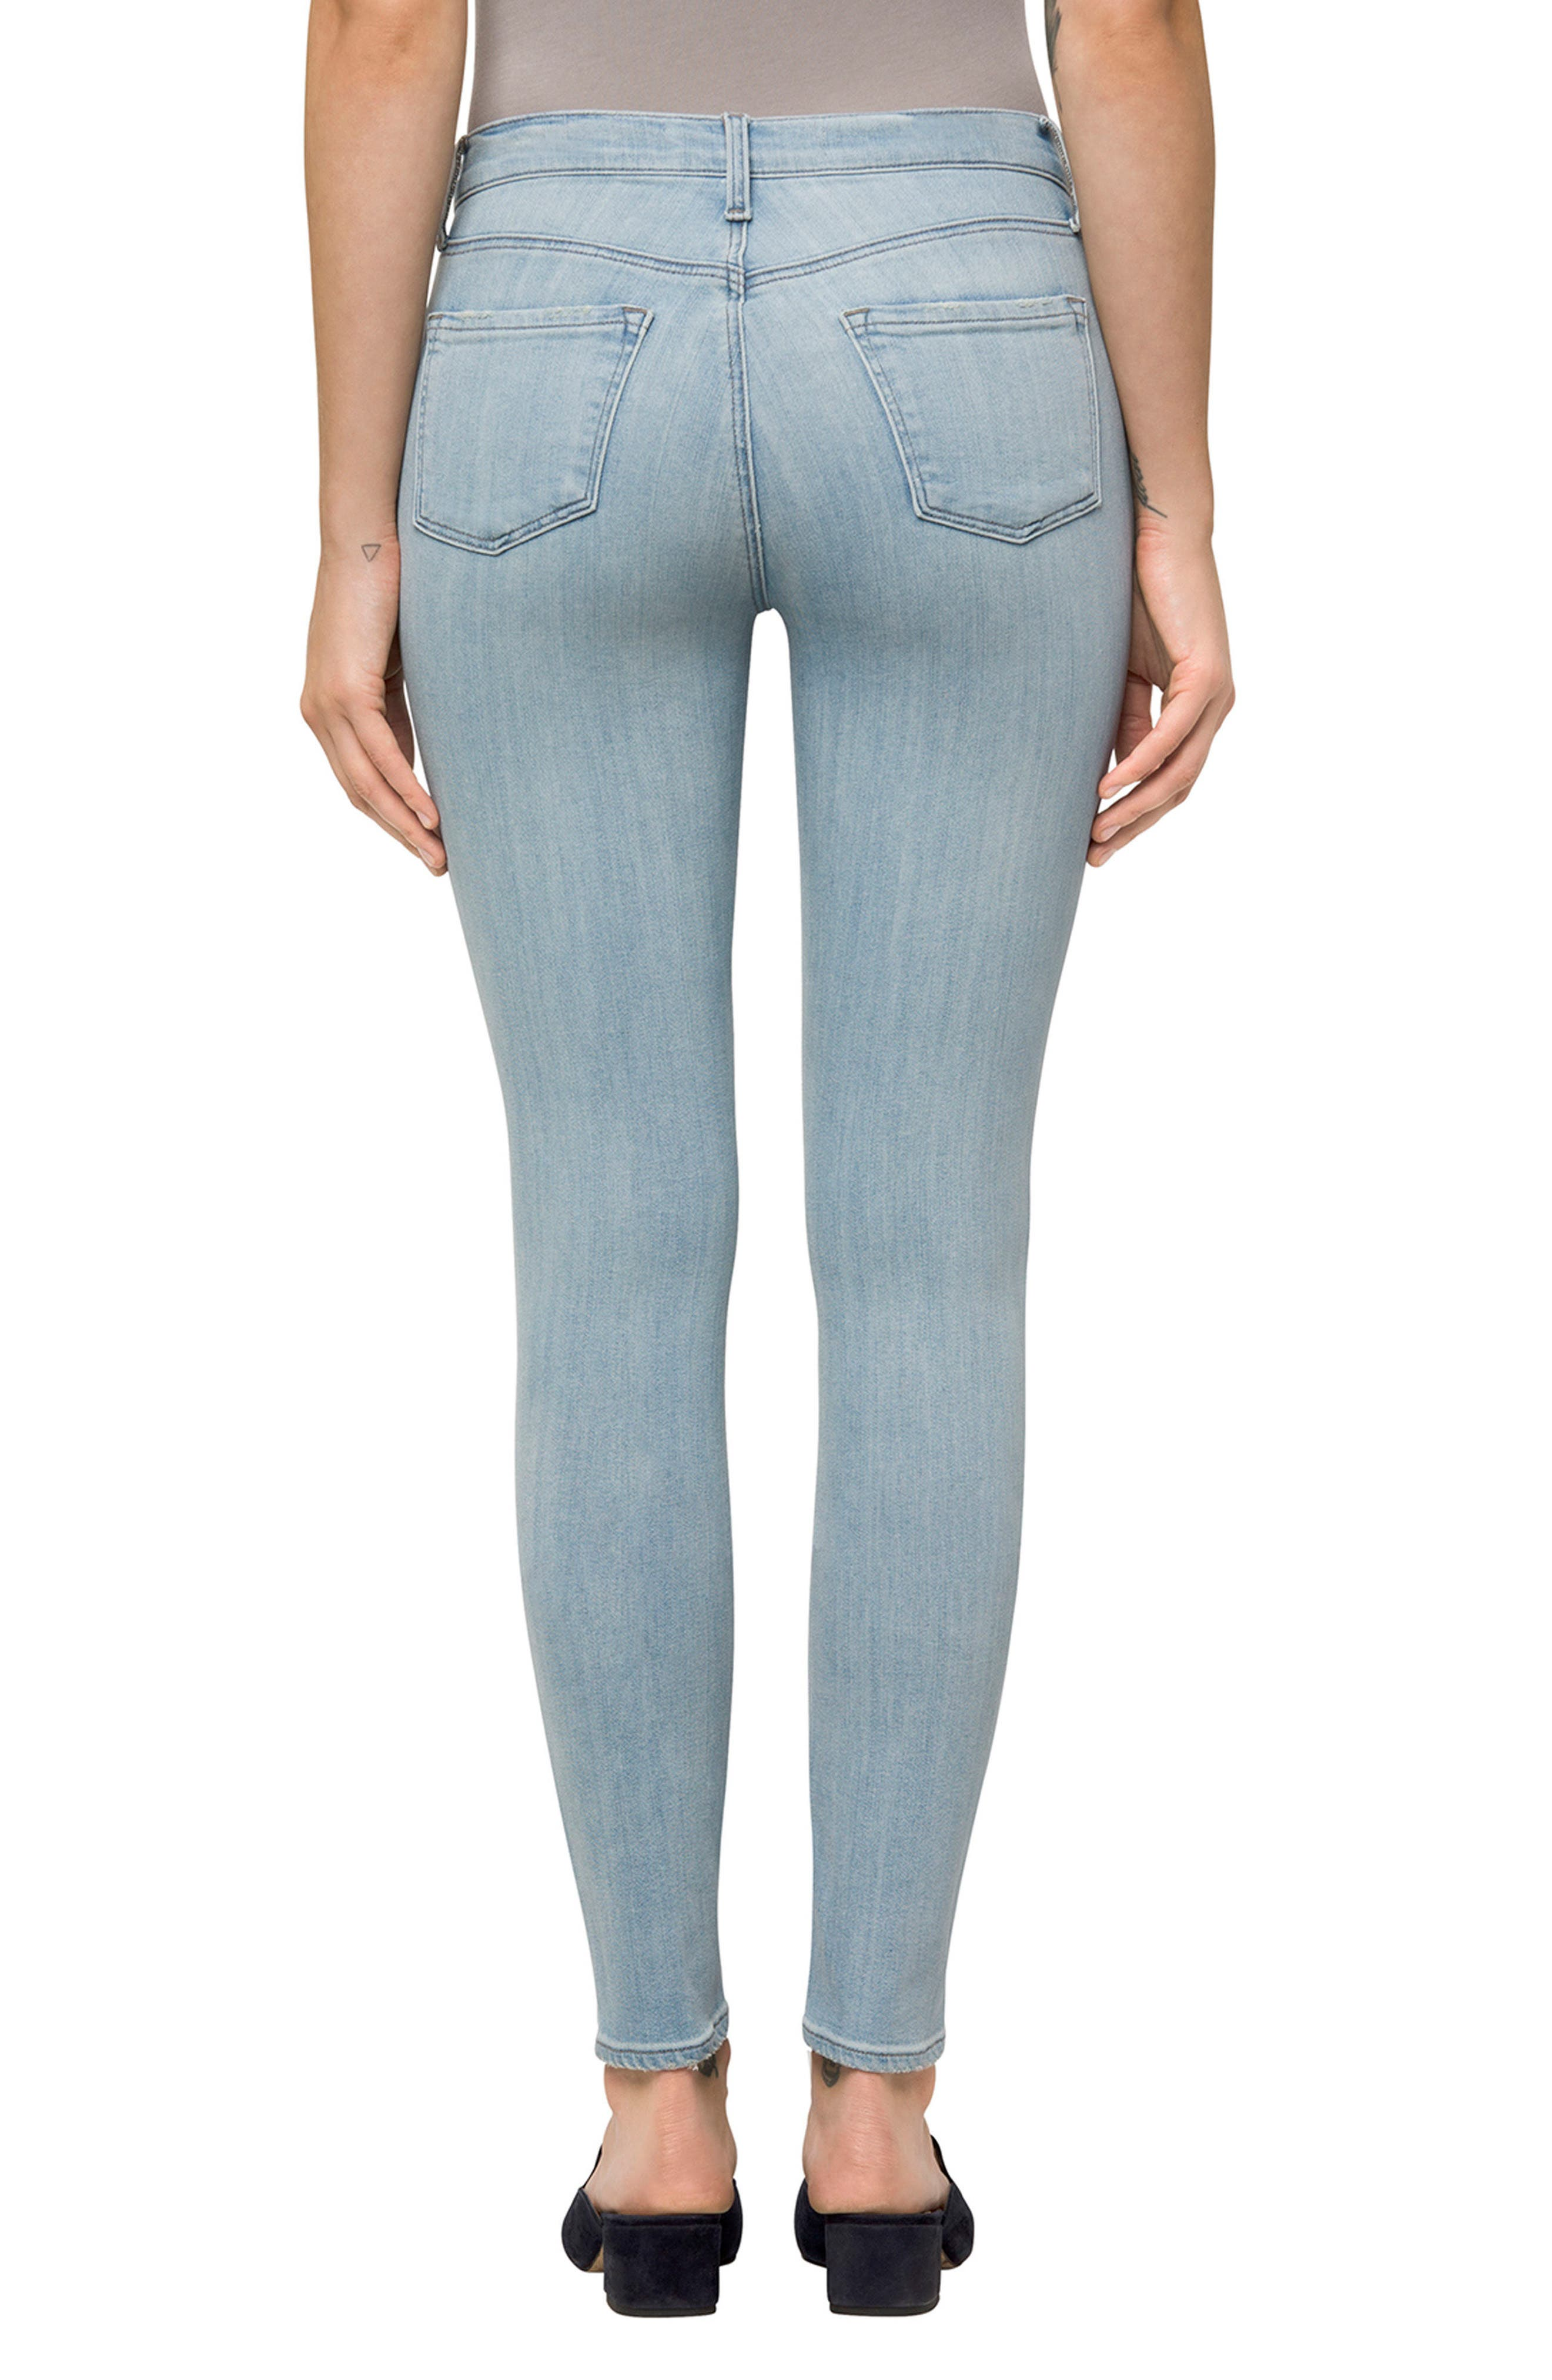 811 Skinny Jeans,                             Alternate thumbnail 2, color,                             Refresh Destruct